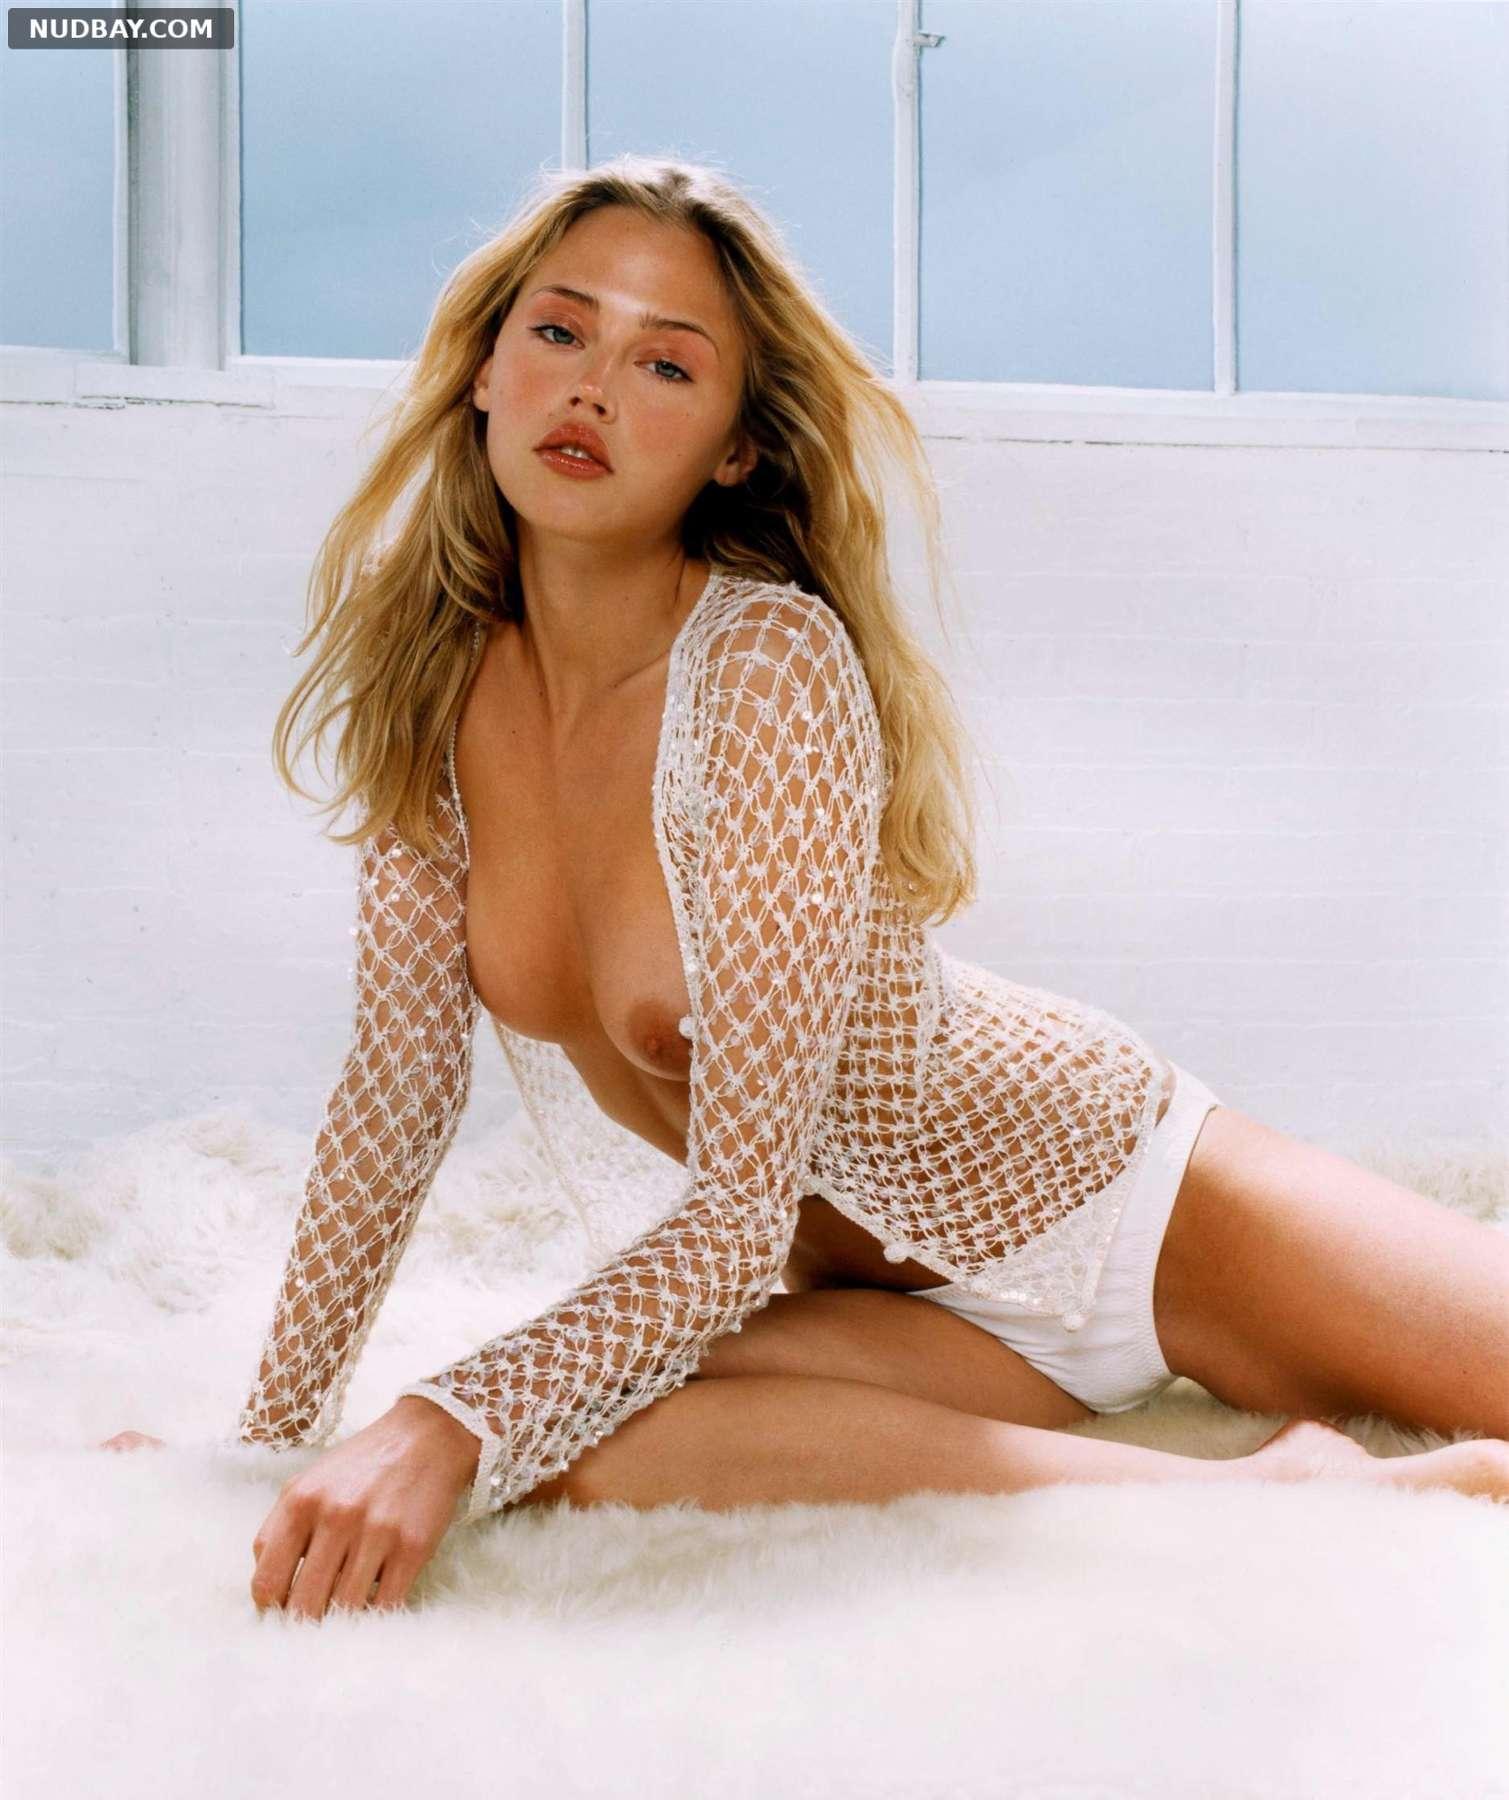 Estella Warren nude in sexy photoshoot